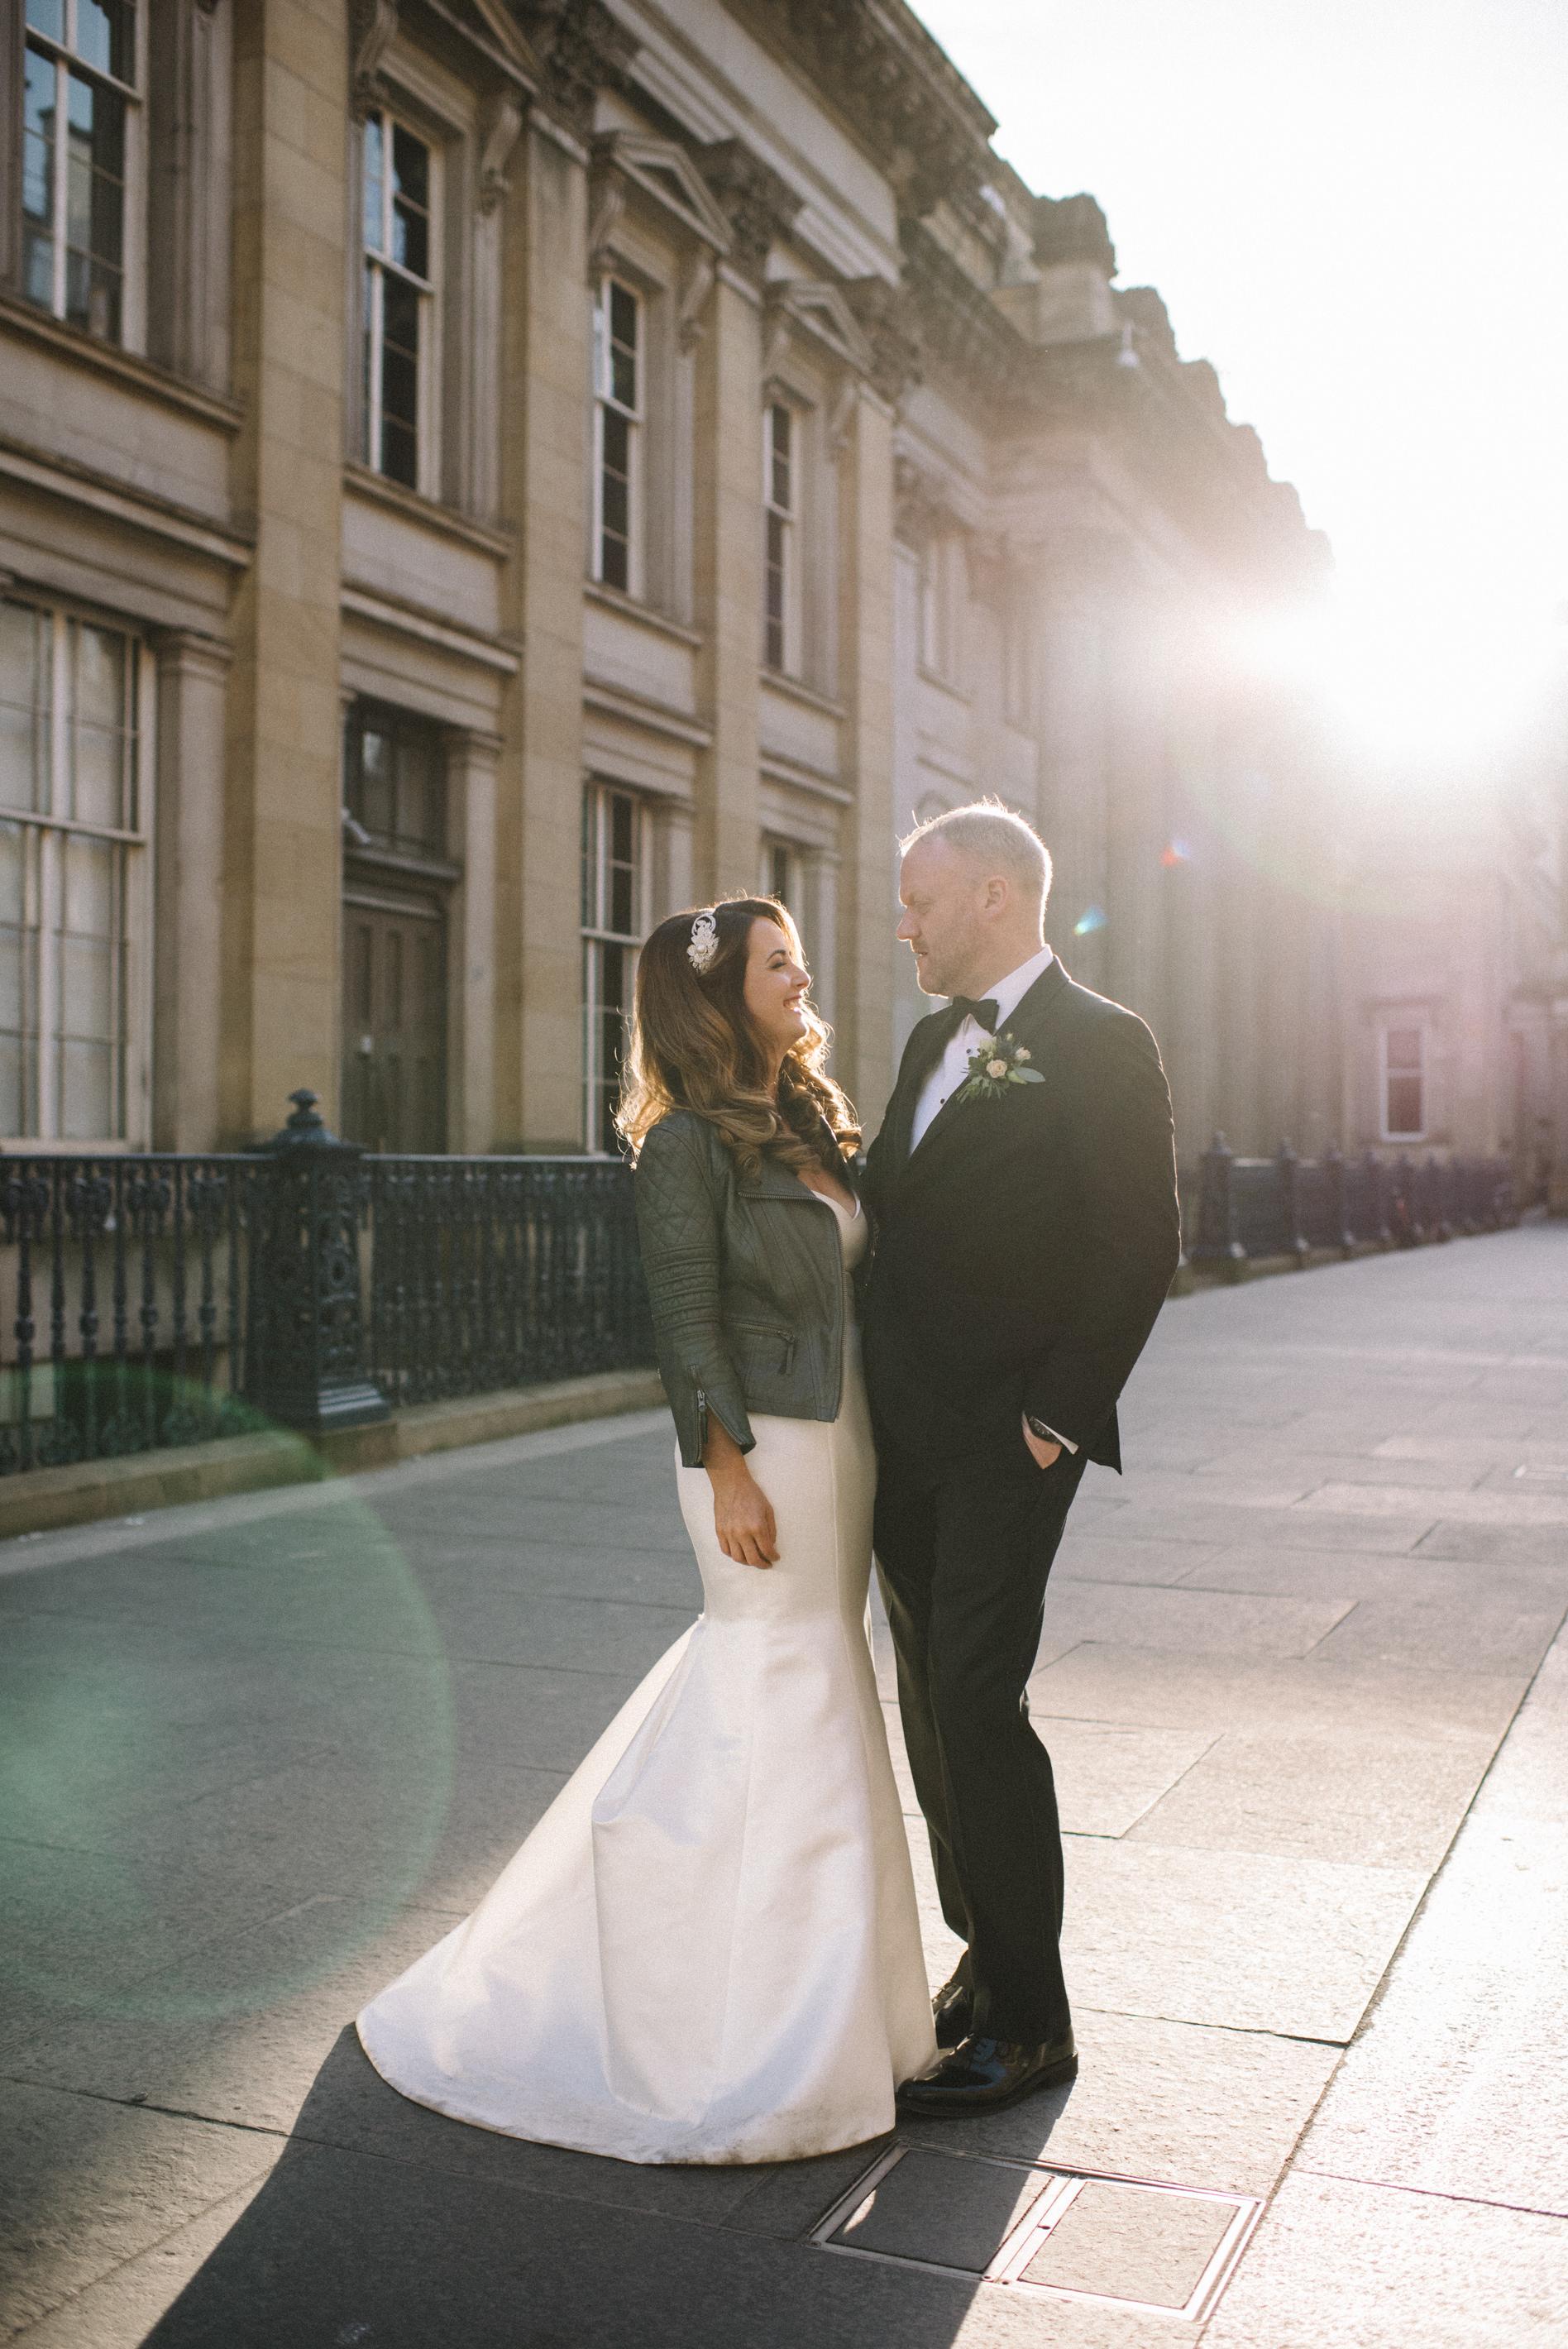 0250-LISA-DEVINE-PHOTOGRAPHY-ALTERNATIVE-WEDDING-PHOTOGRAPHY-SCOTLAND-DESTINATION-WEDDINGS-GLASGOW-WEDDINGS-COOL-WEDDINGS-STYLISH-WEDDINGS.JPG